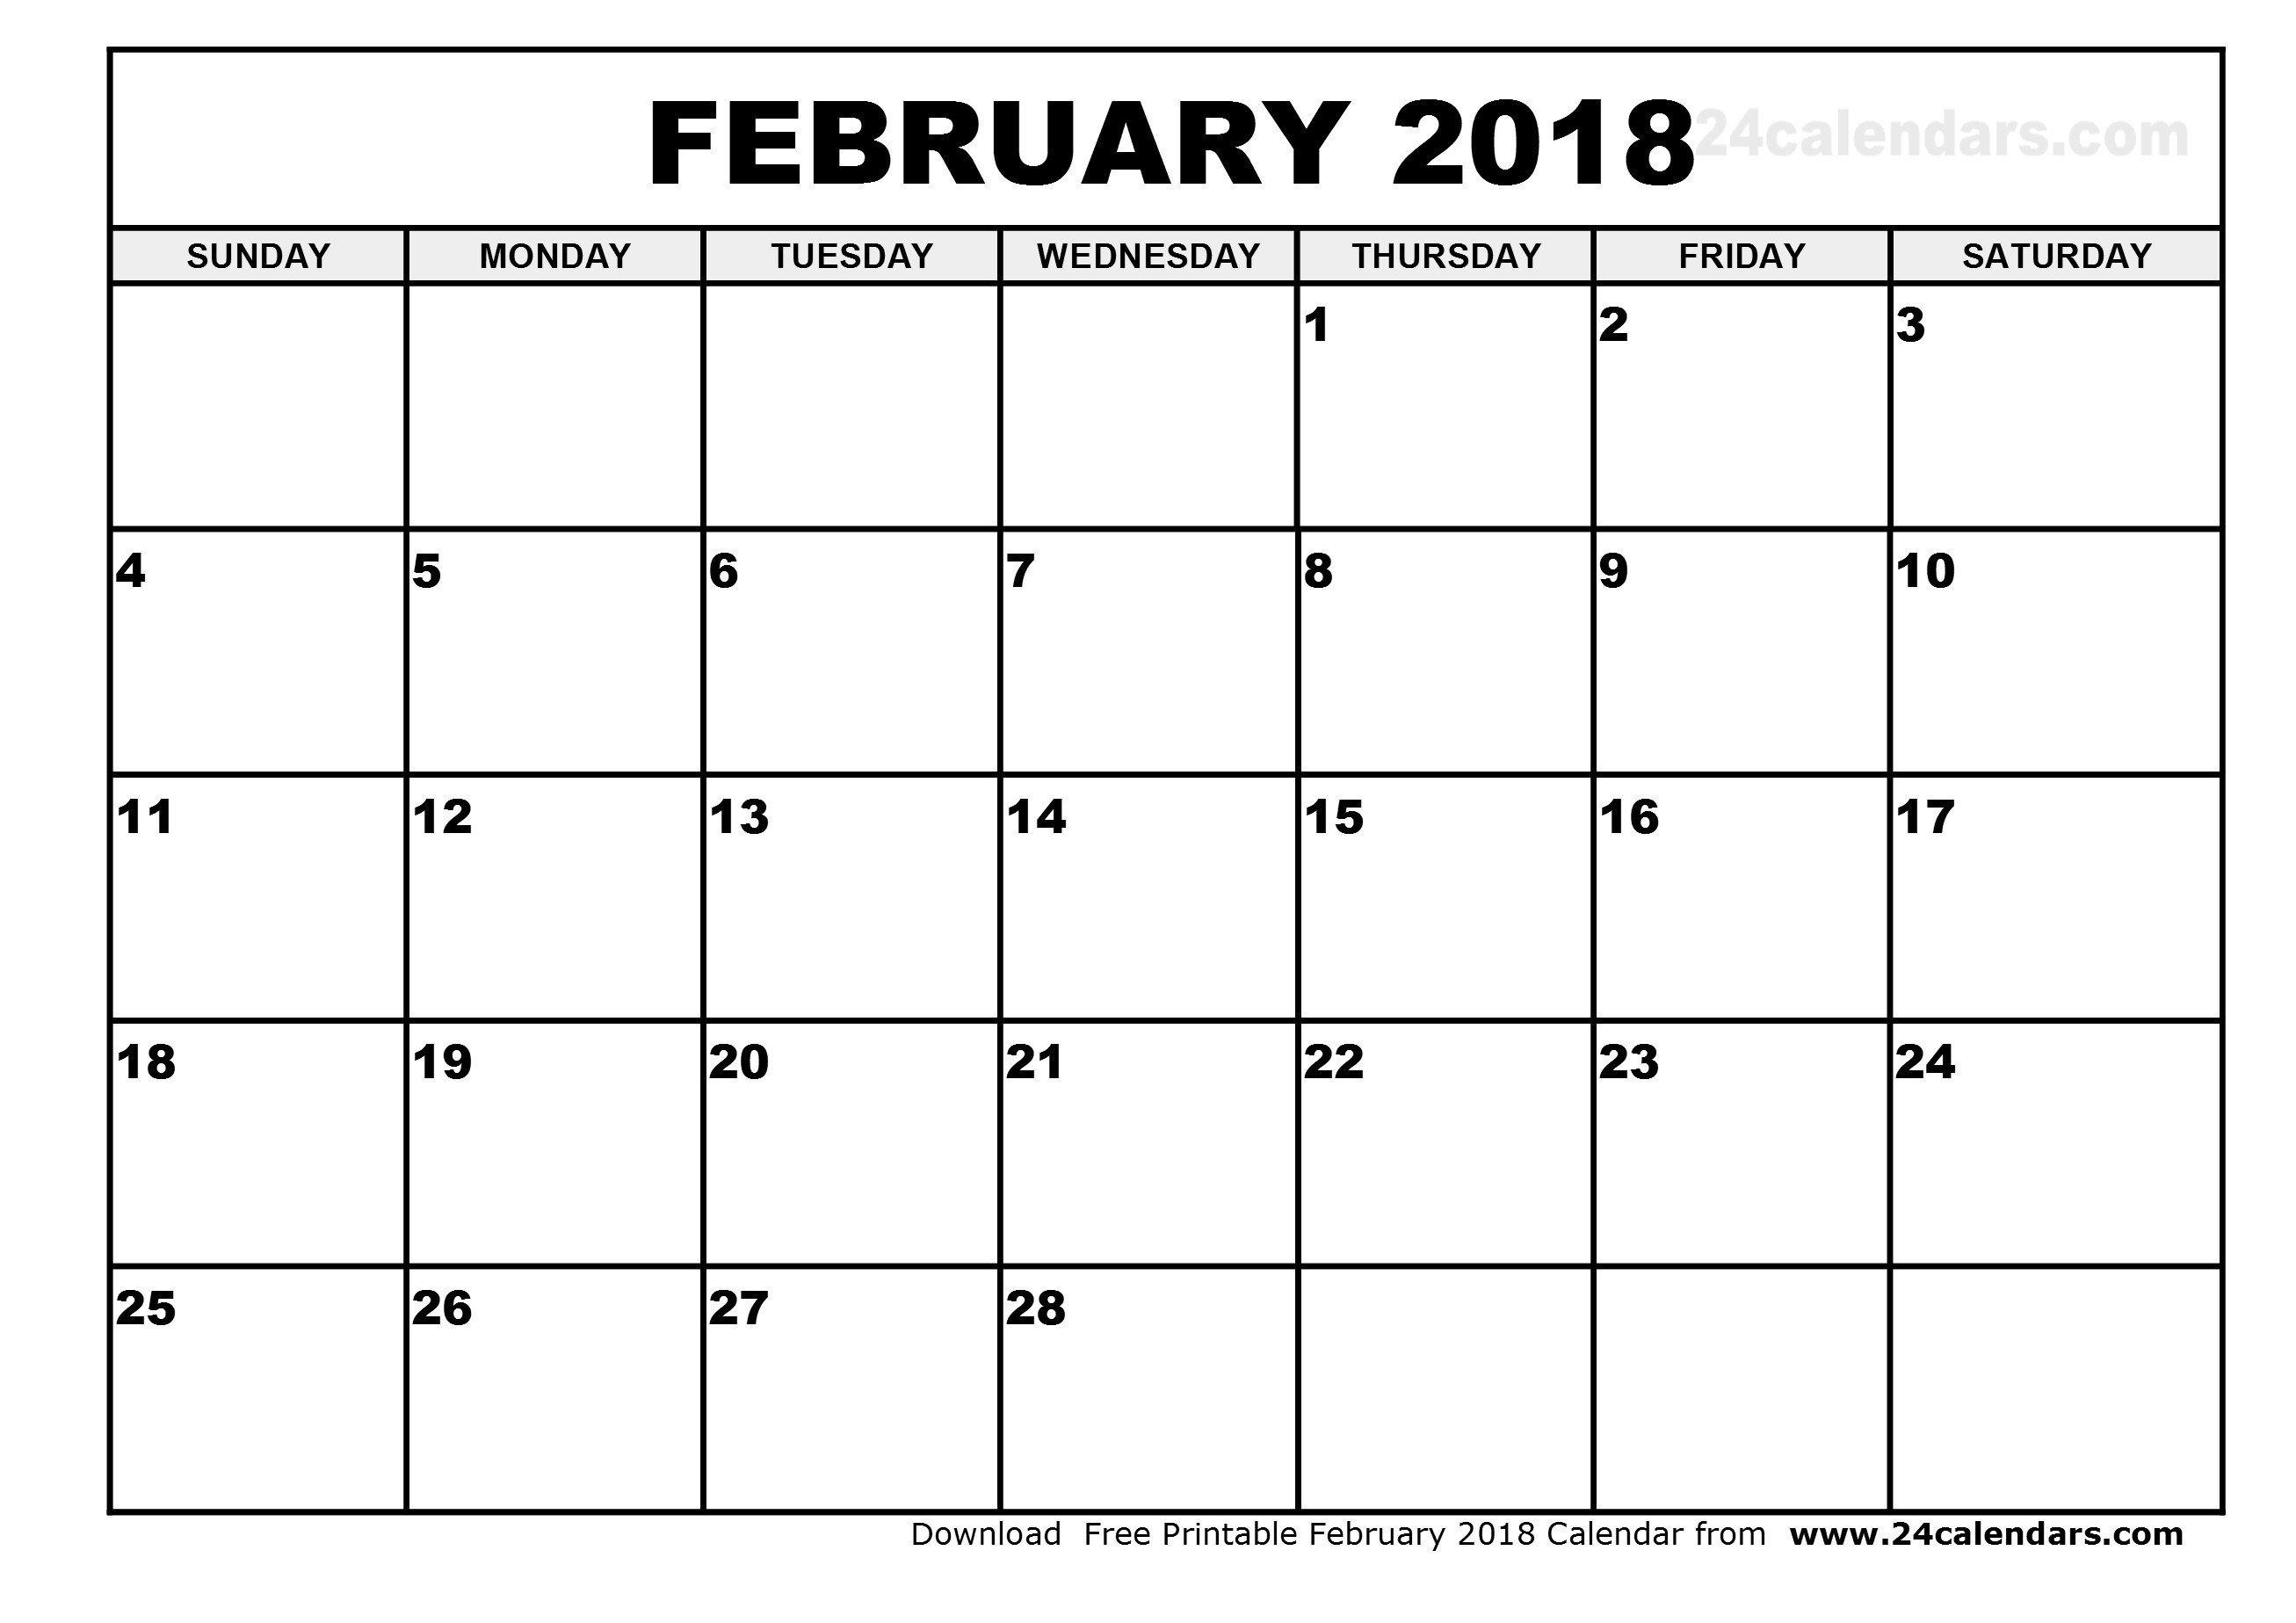 Advice Regarding Calendar Labs 2019 Monthly Calendar - Calendar Calendar 2019 Calendarlabs